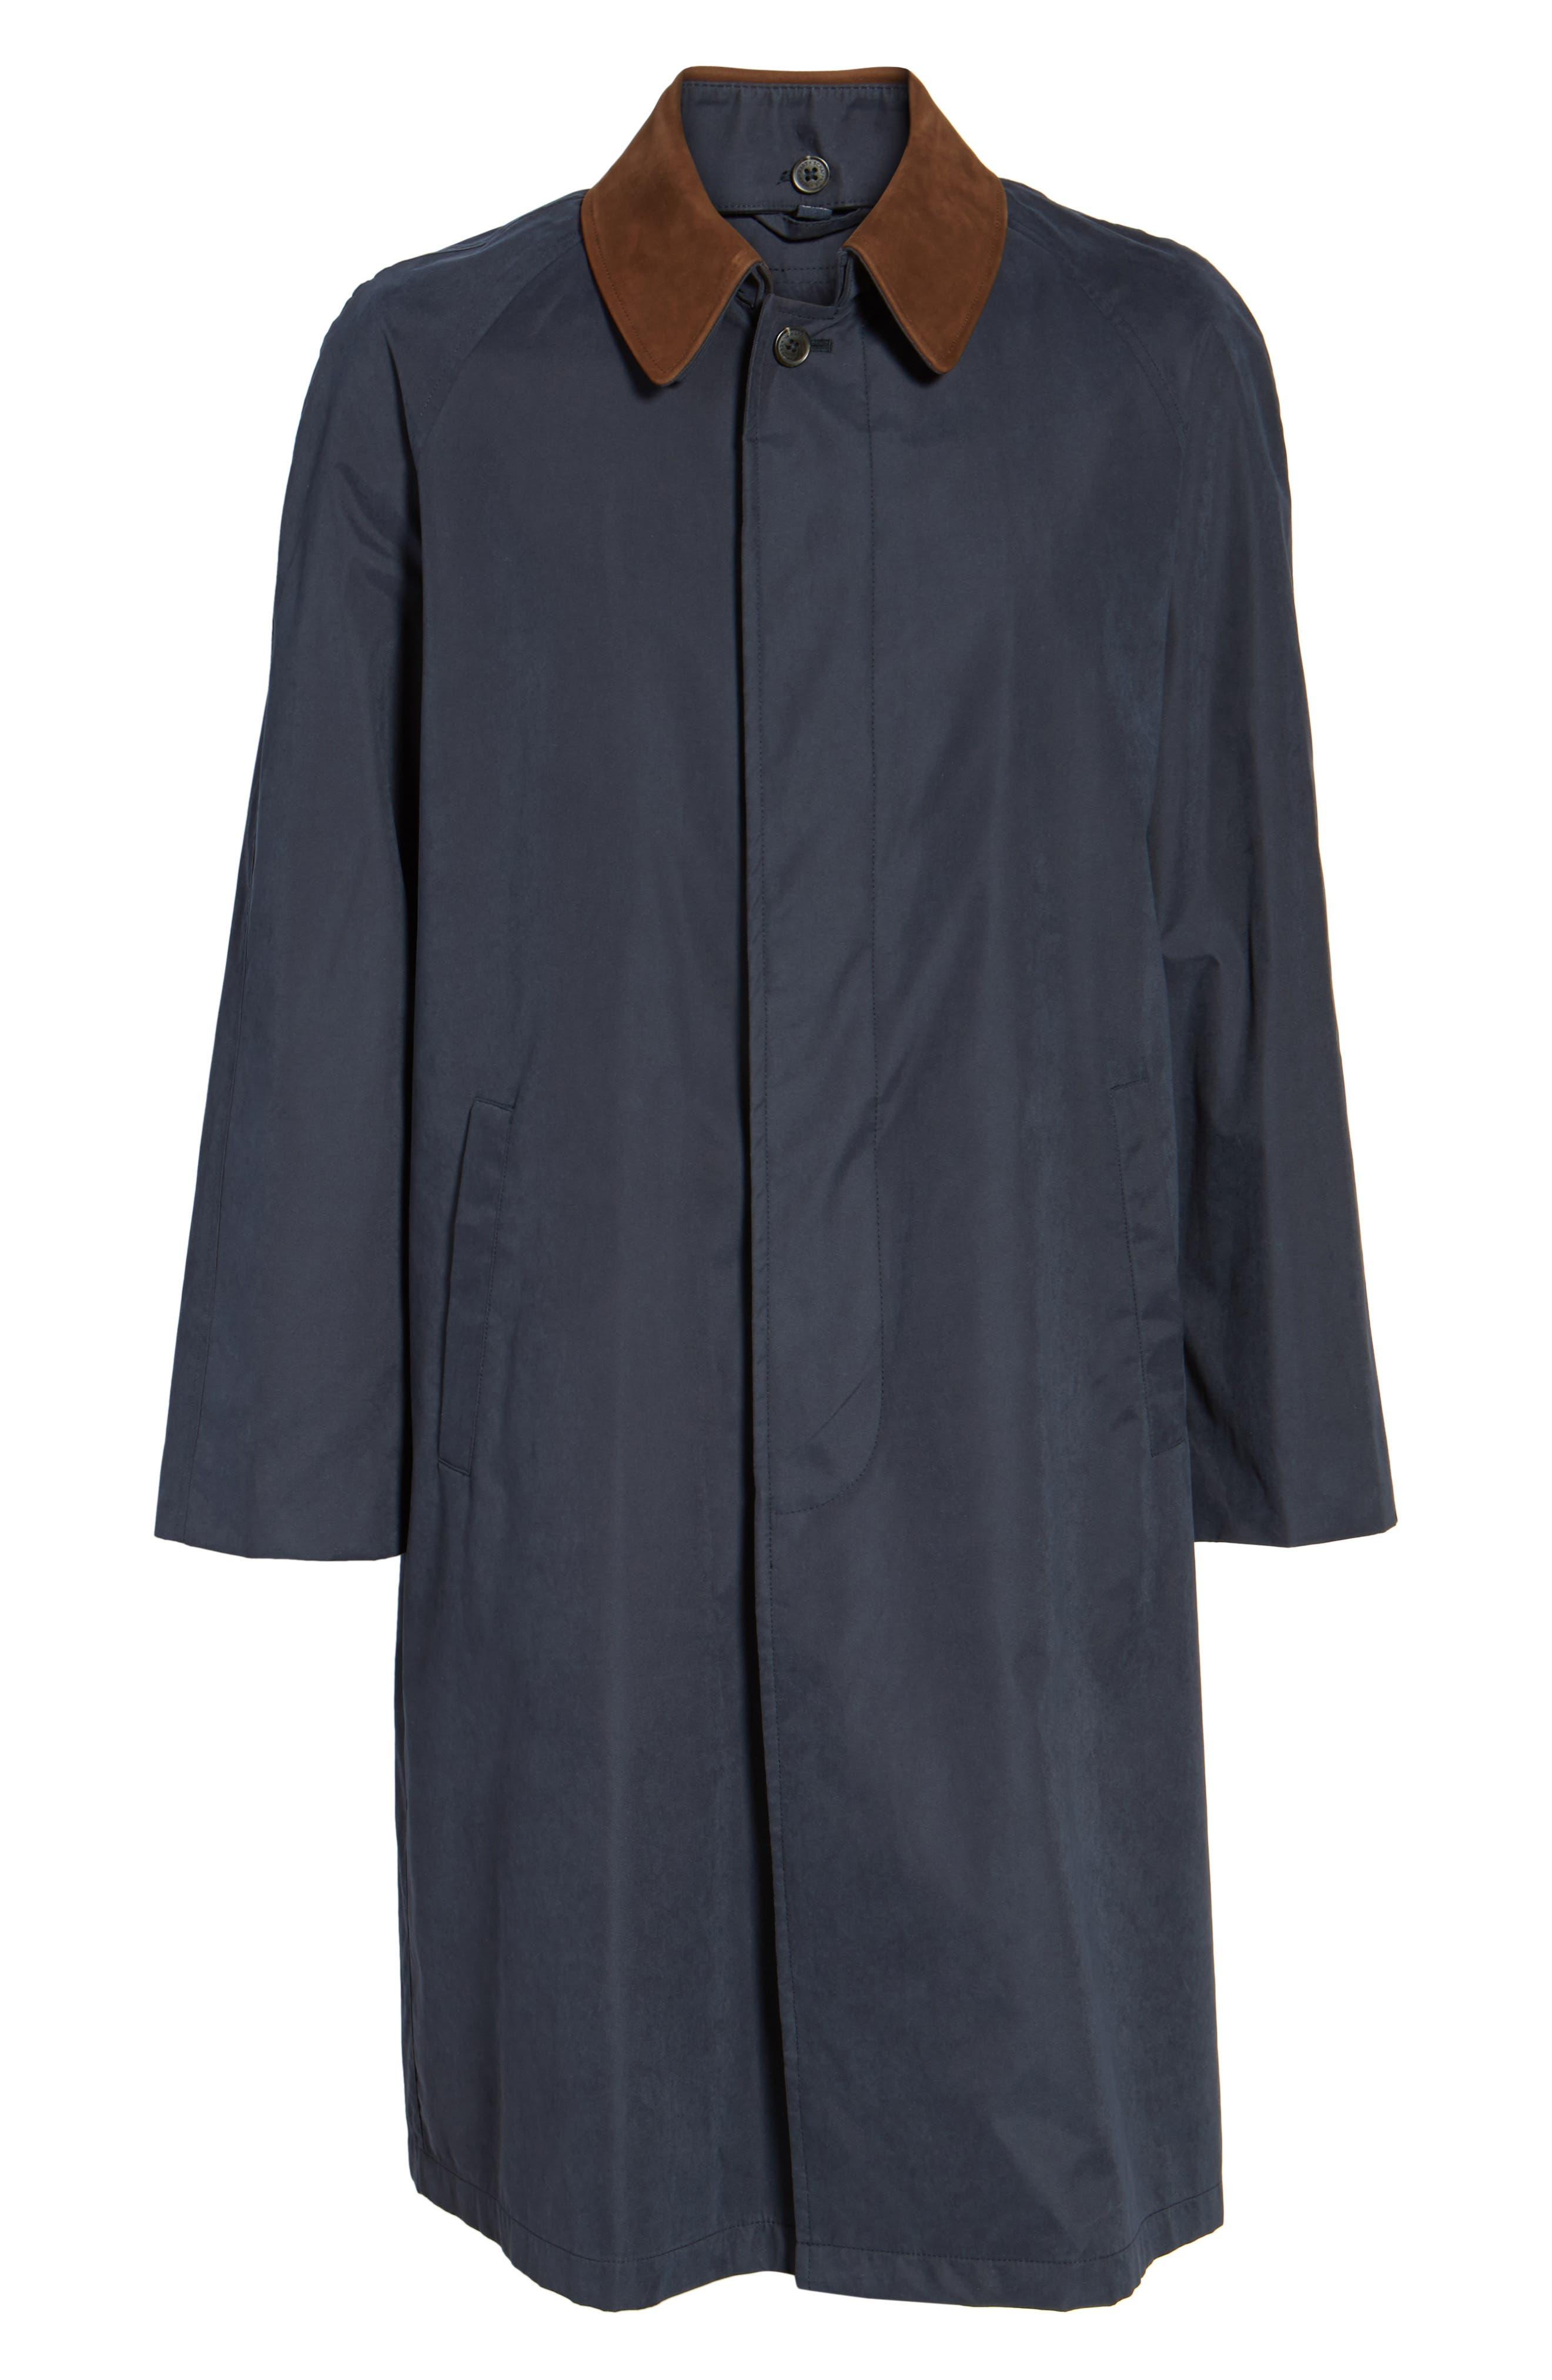 Lawrence Classic Fit Rain Coat,                             Alternate thumbnail 5, color,                             410